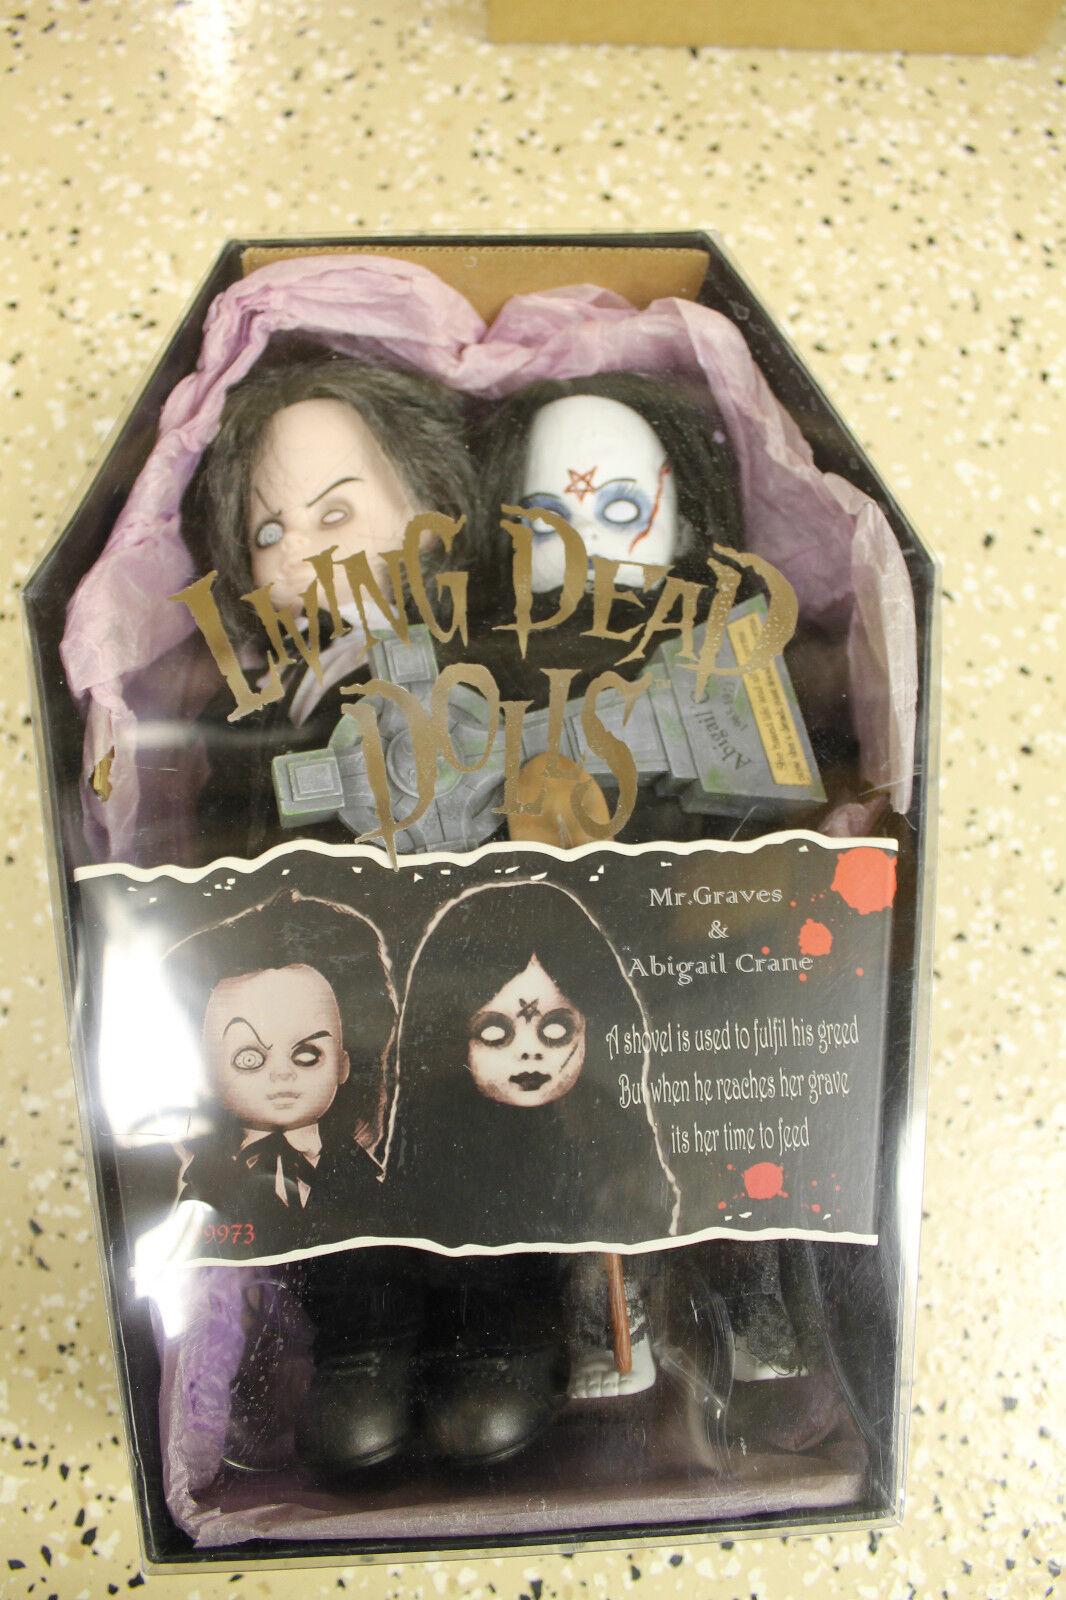 Mezco Living Dead Dolls  Mr. Graves and Abigail Crane  Figure Full Size